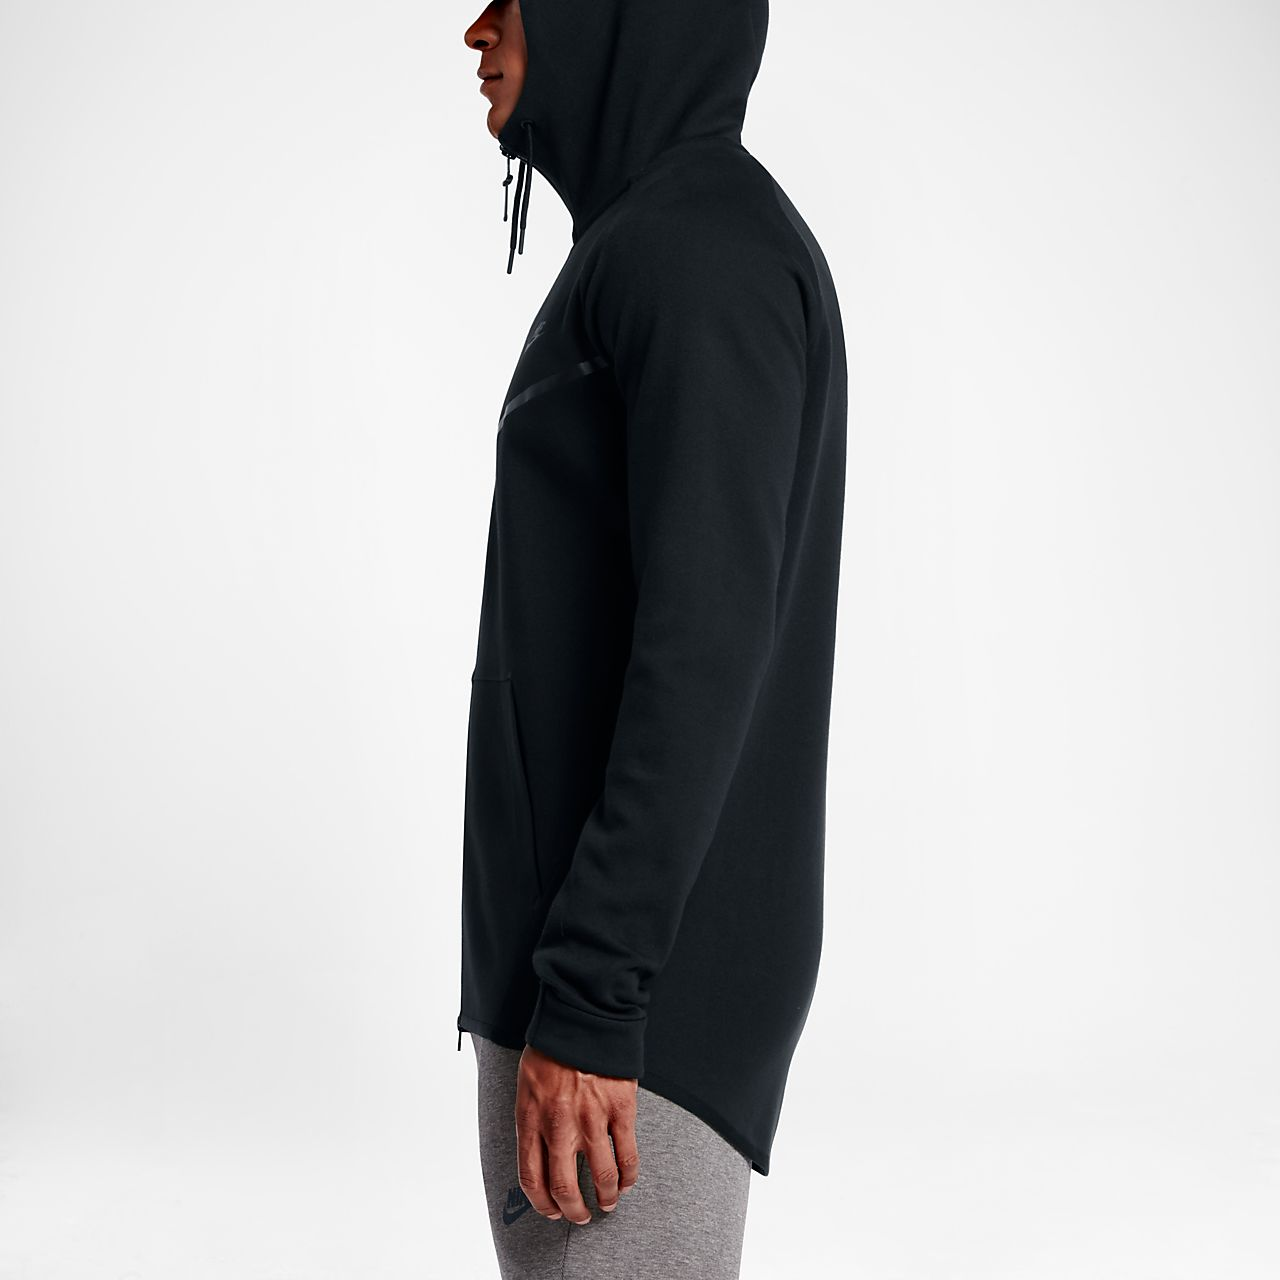 nike sportswear tech fleece windrunner men 39 s full zip hoodie. Black Bedroom Furniture Sets. Home Design Ideas